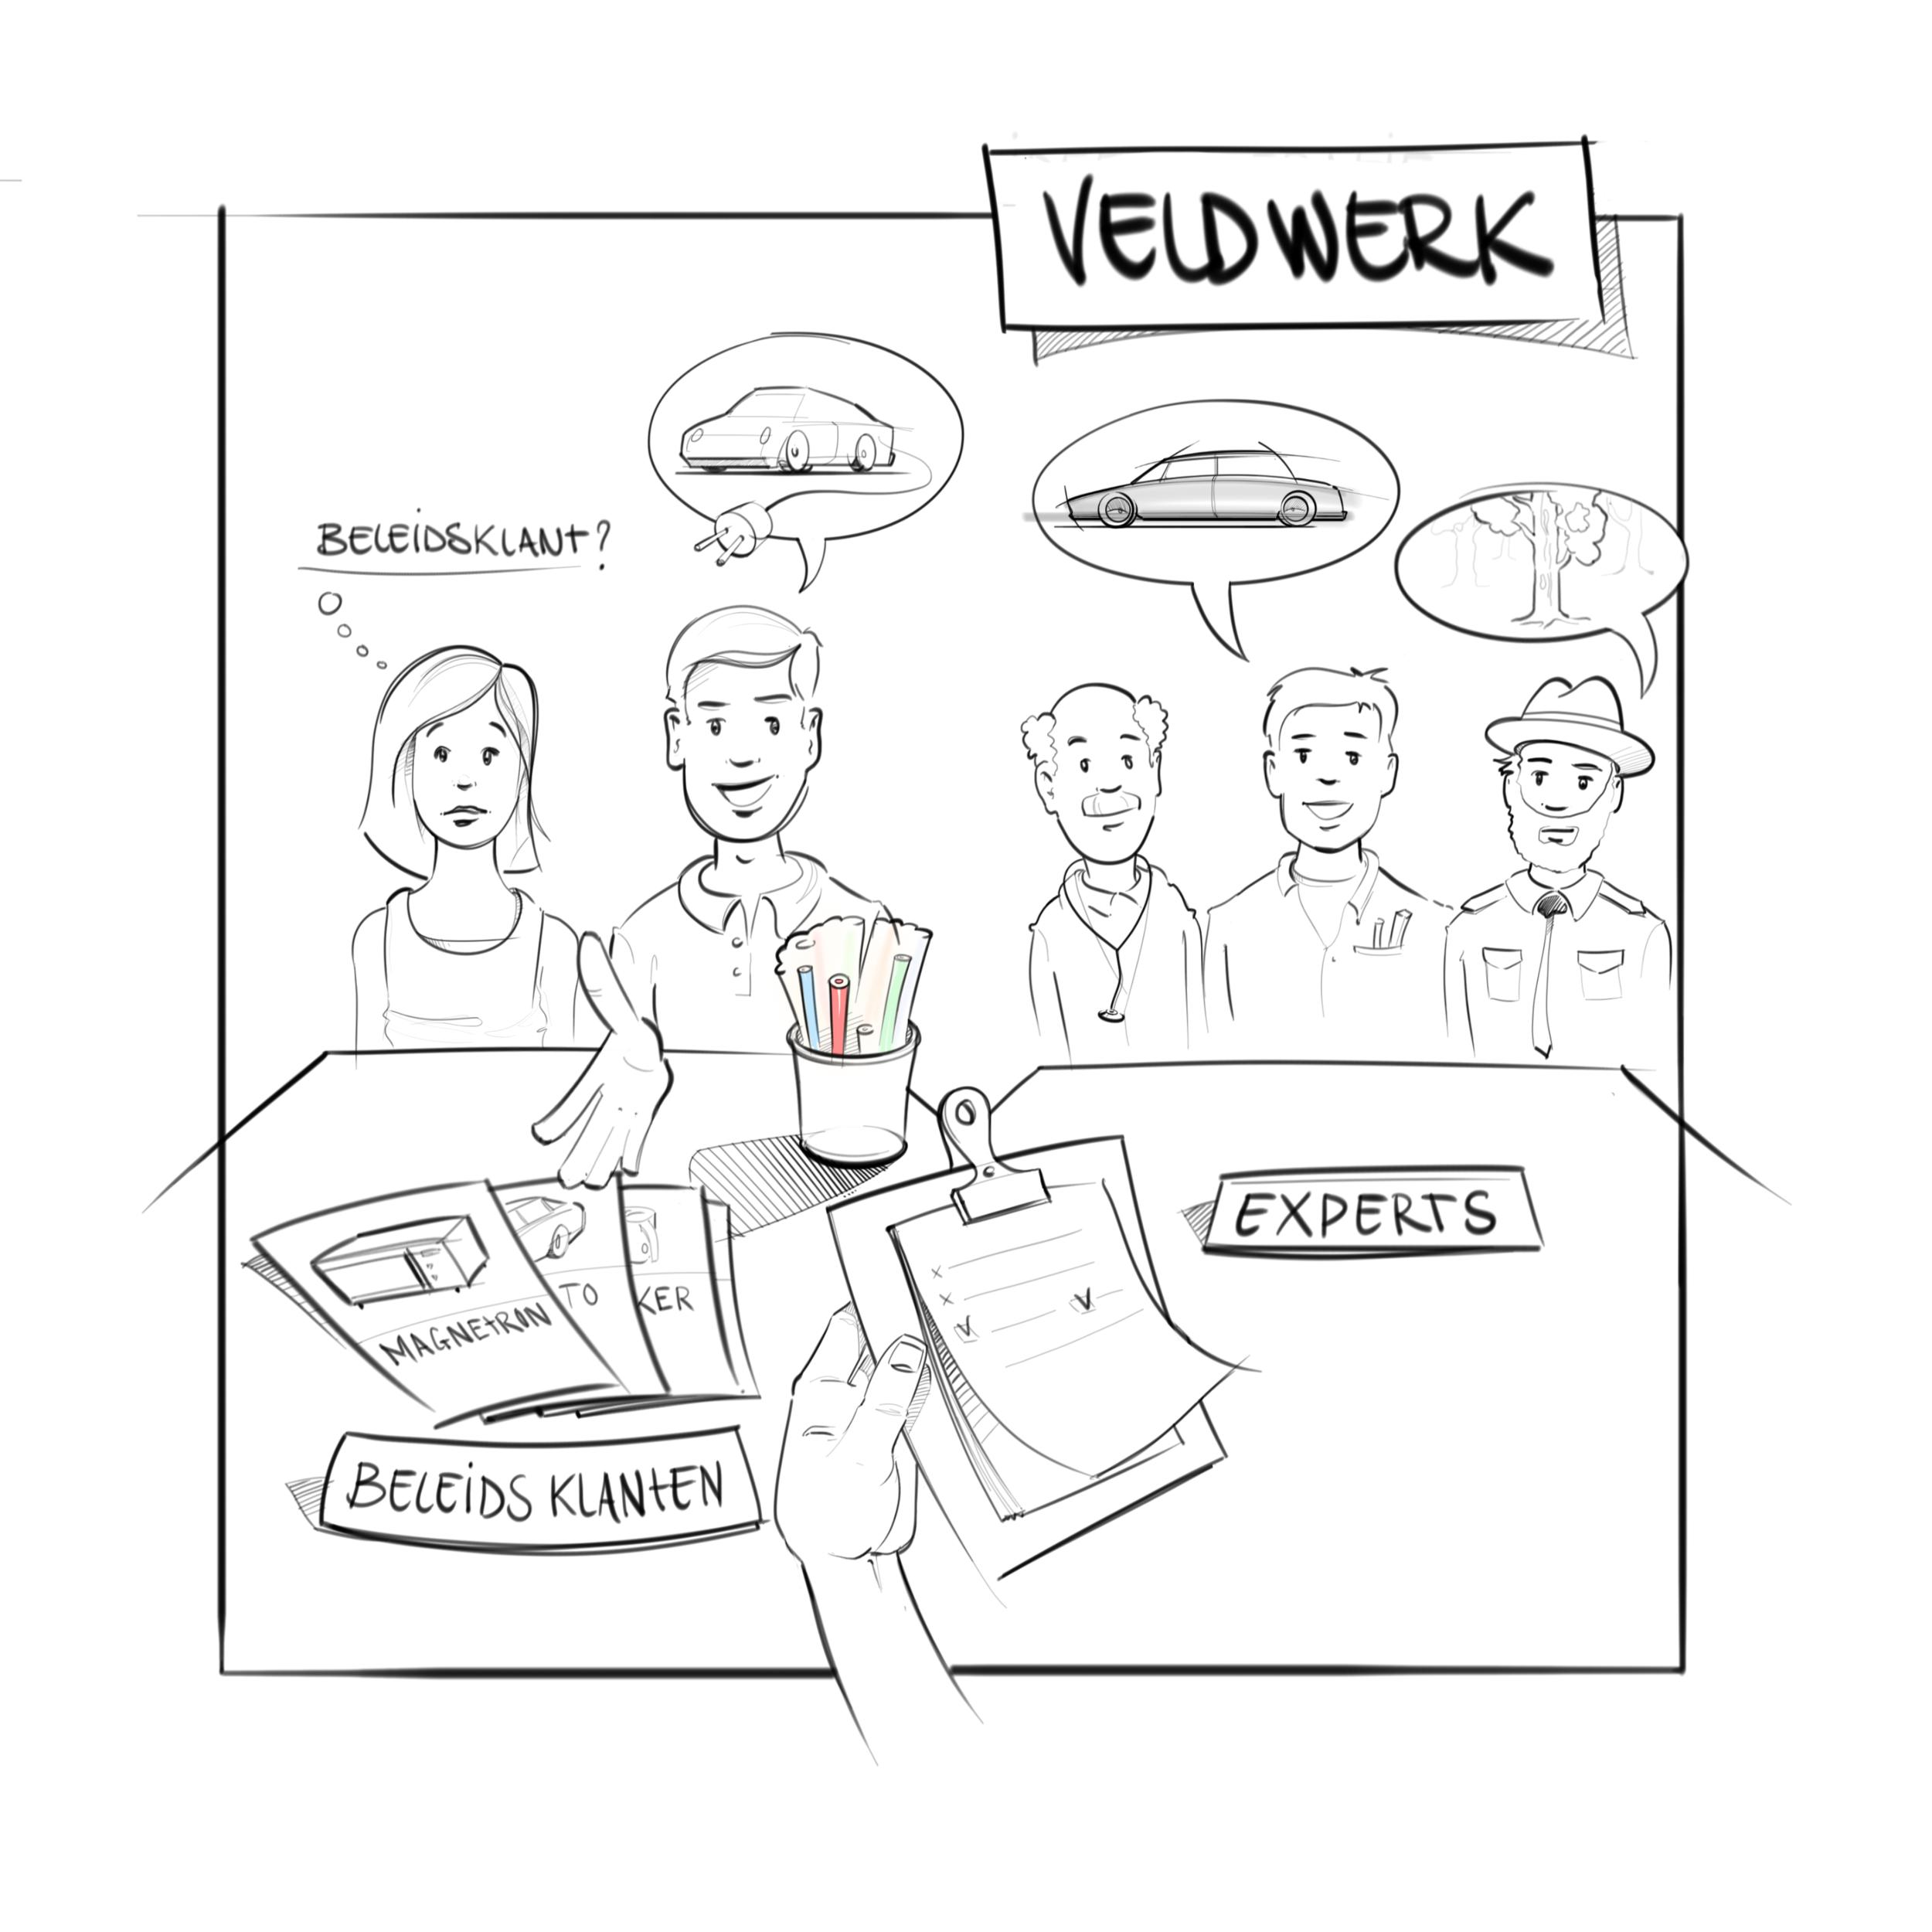 Final - Veldwerk.png